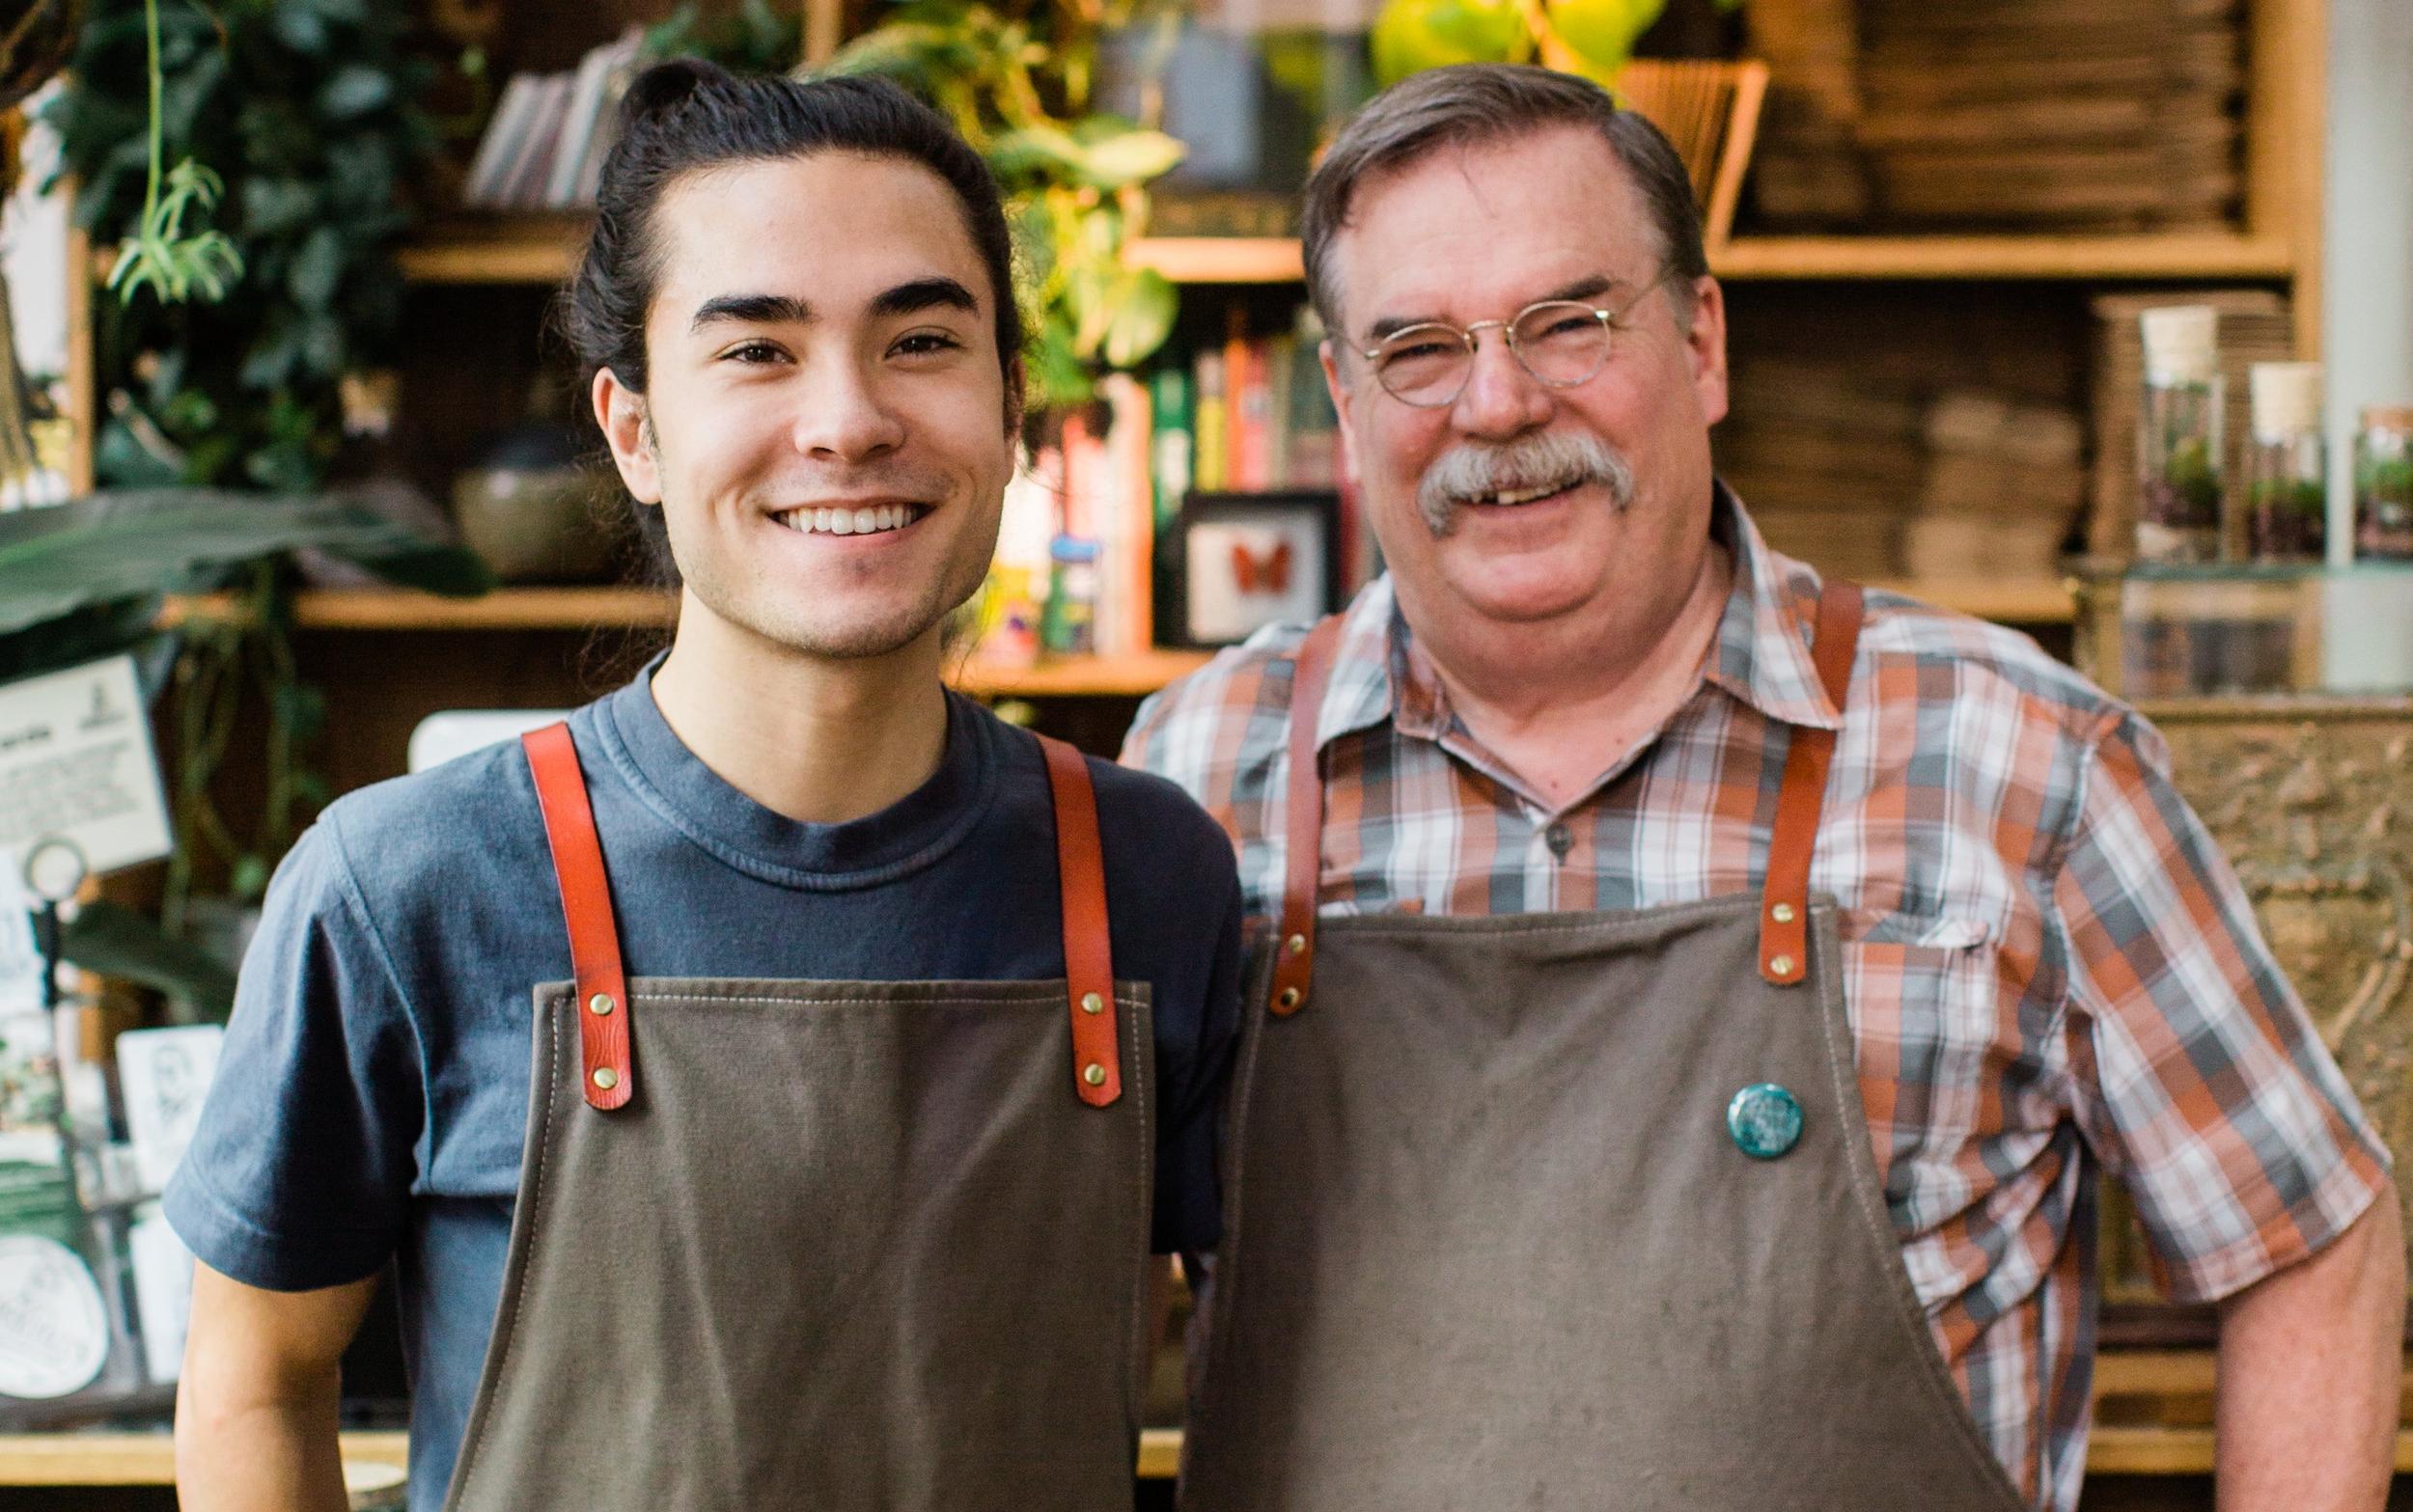 James Harris & Gregg Harris, a Father & Son Team